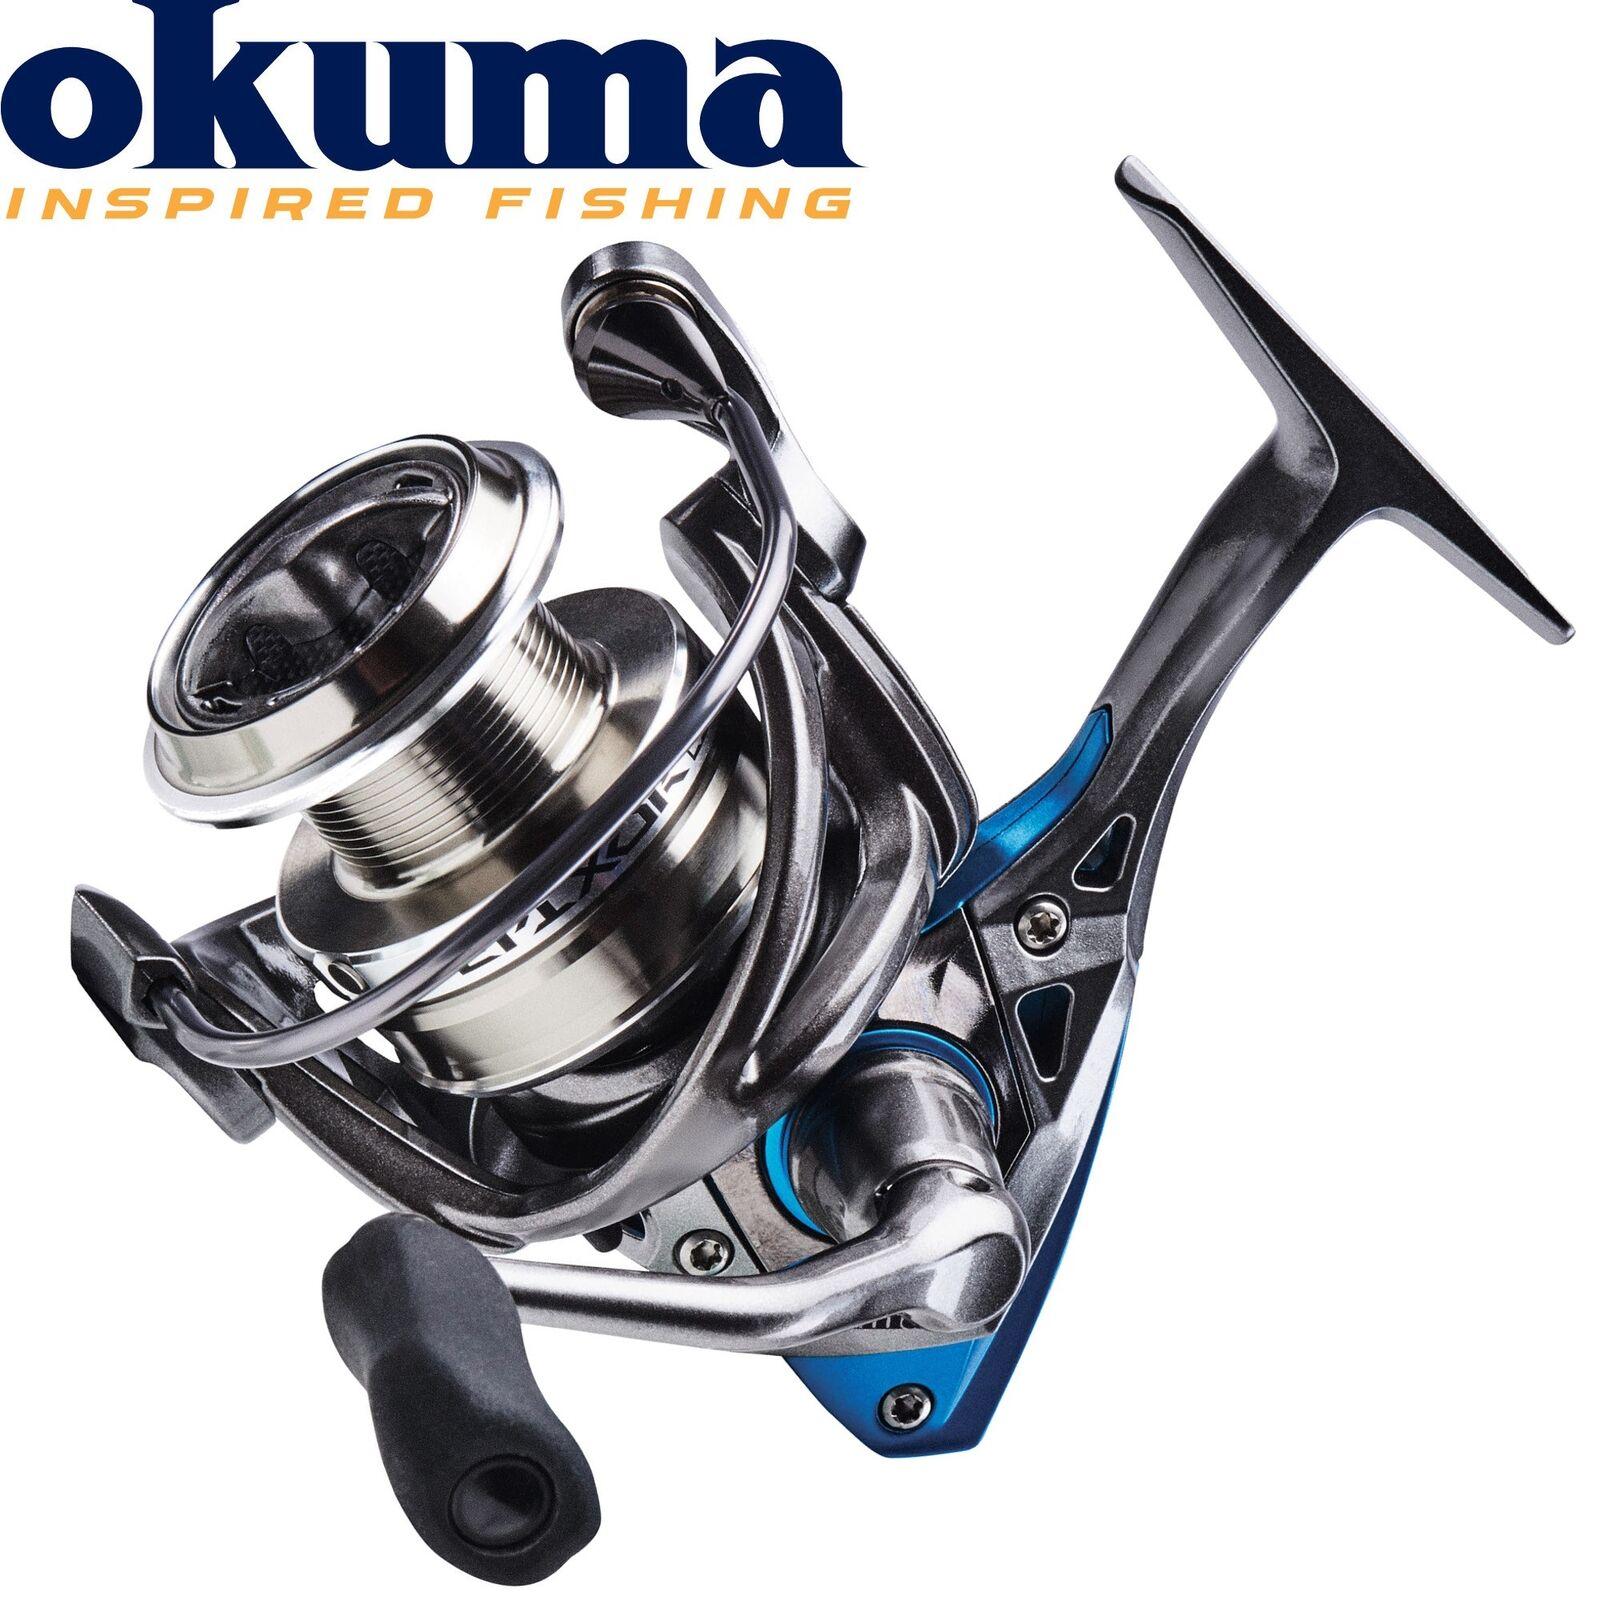 Okuma Epixor LS Spinning EPL-30 - Spinnrolle zum Zanderangeln, Stationärrolle